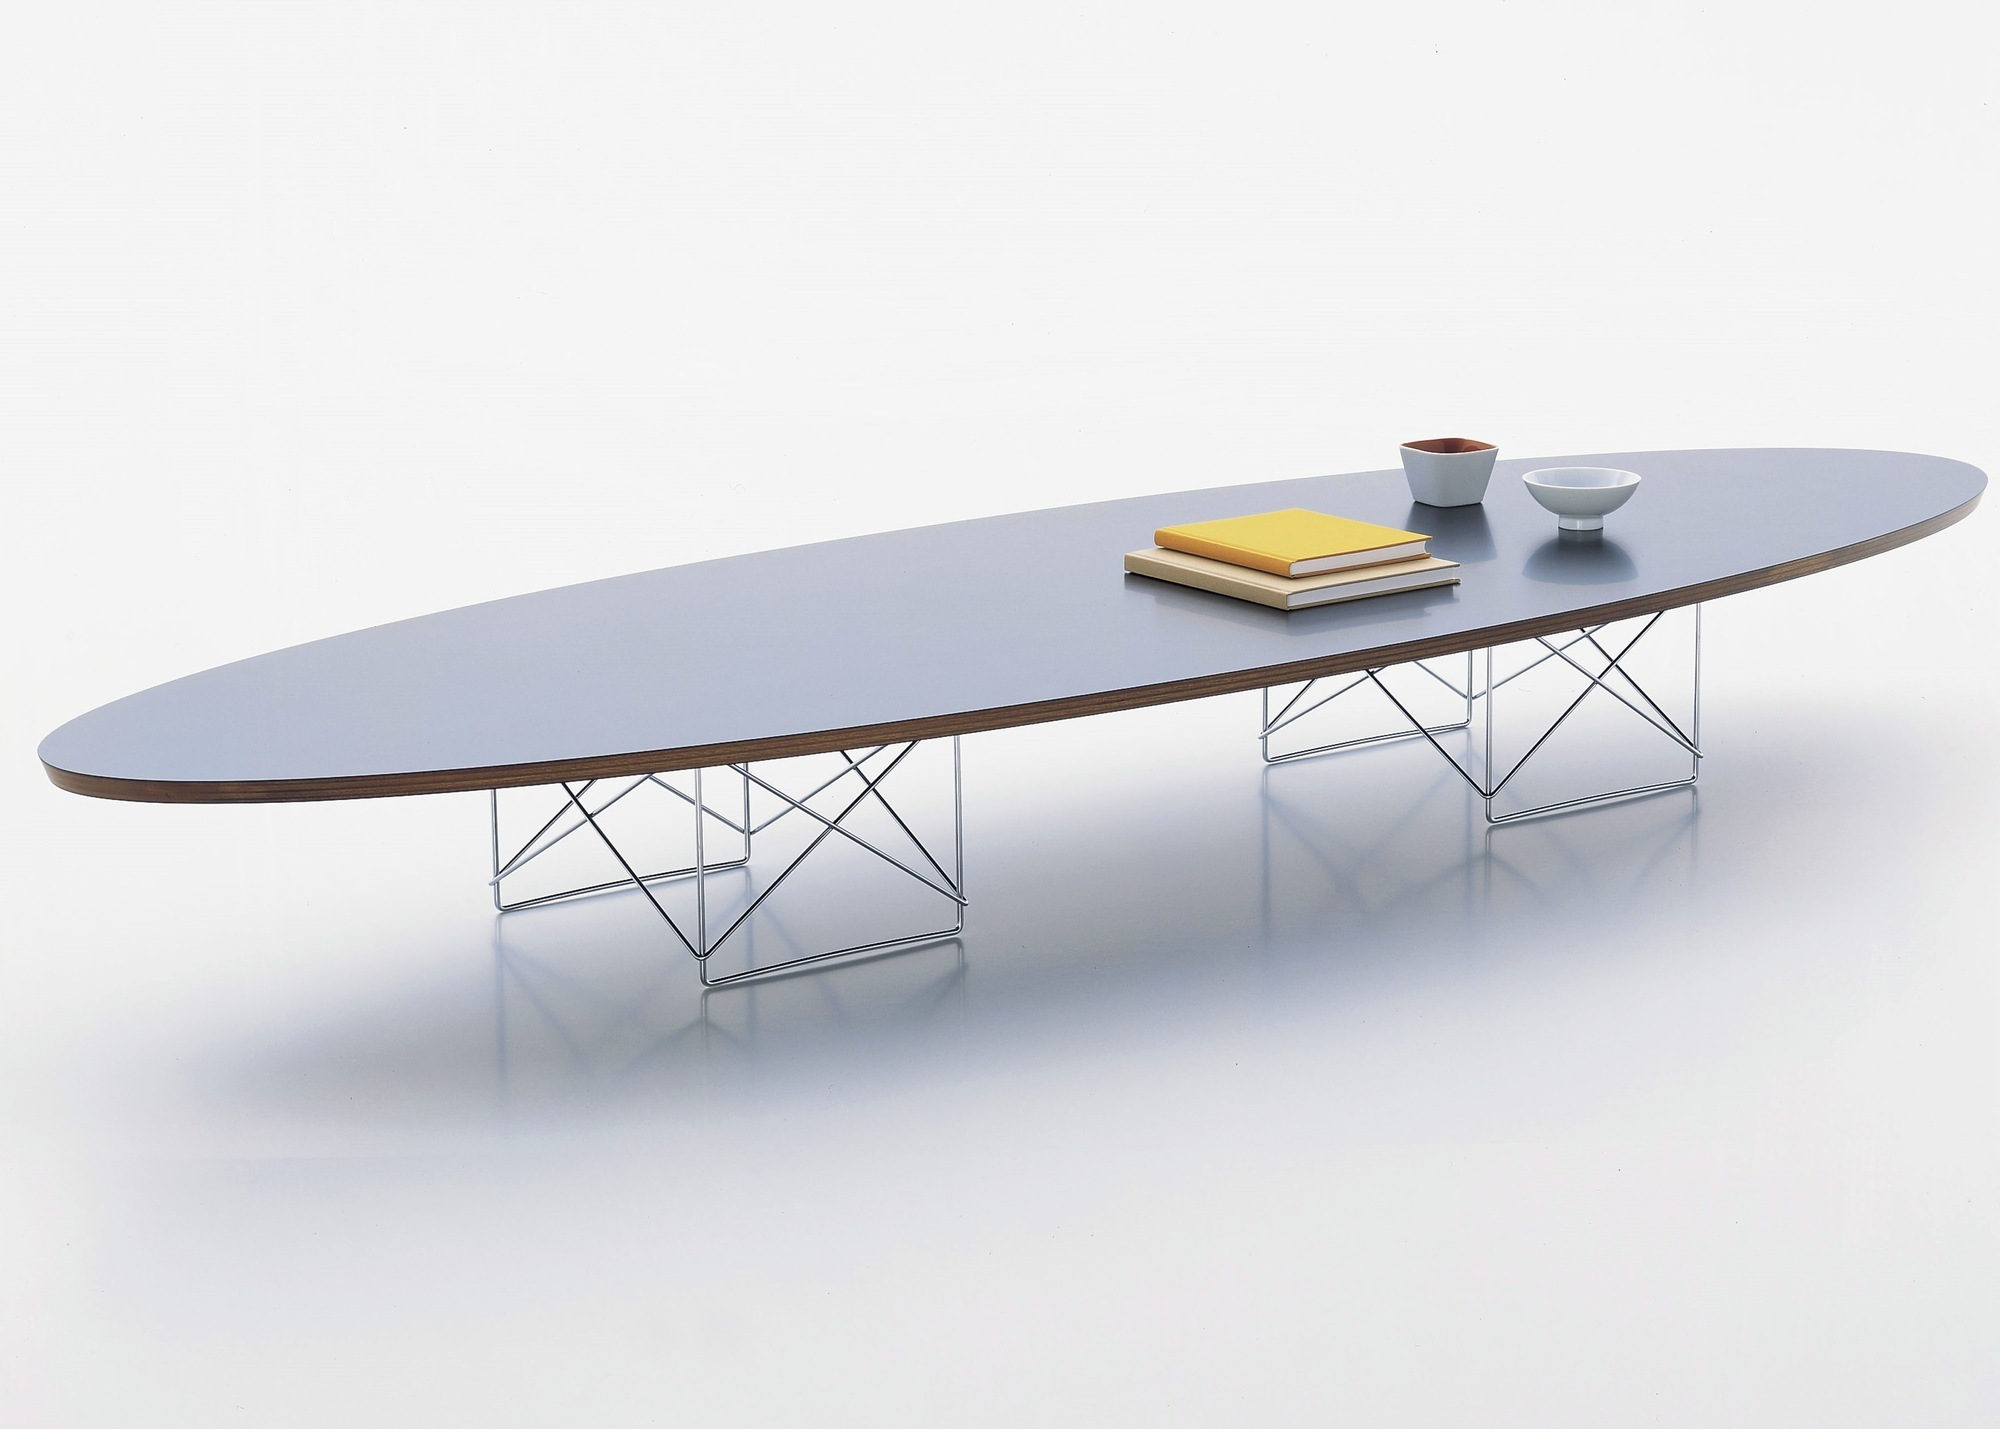 1532003829-wohnzimmer-vitra-eliptical-table-etr.jpg